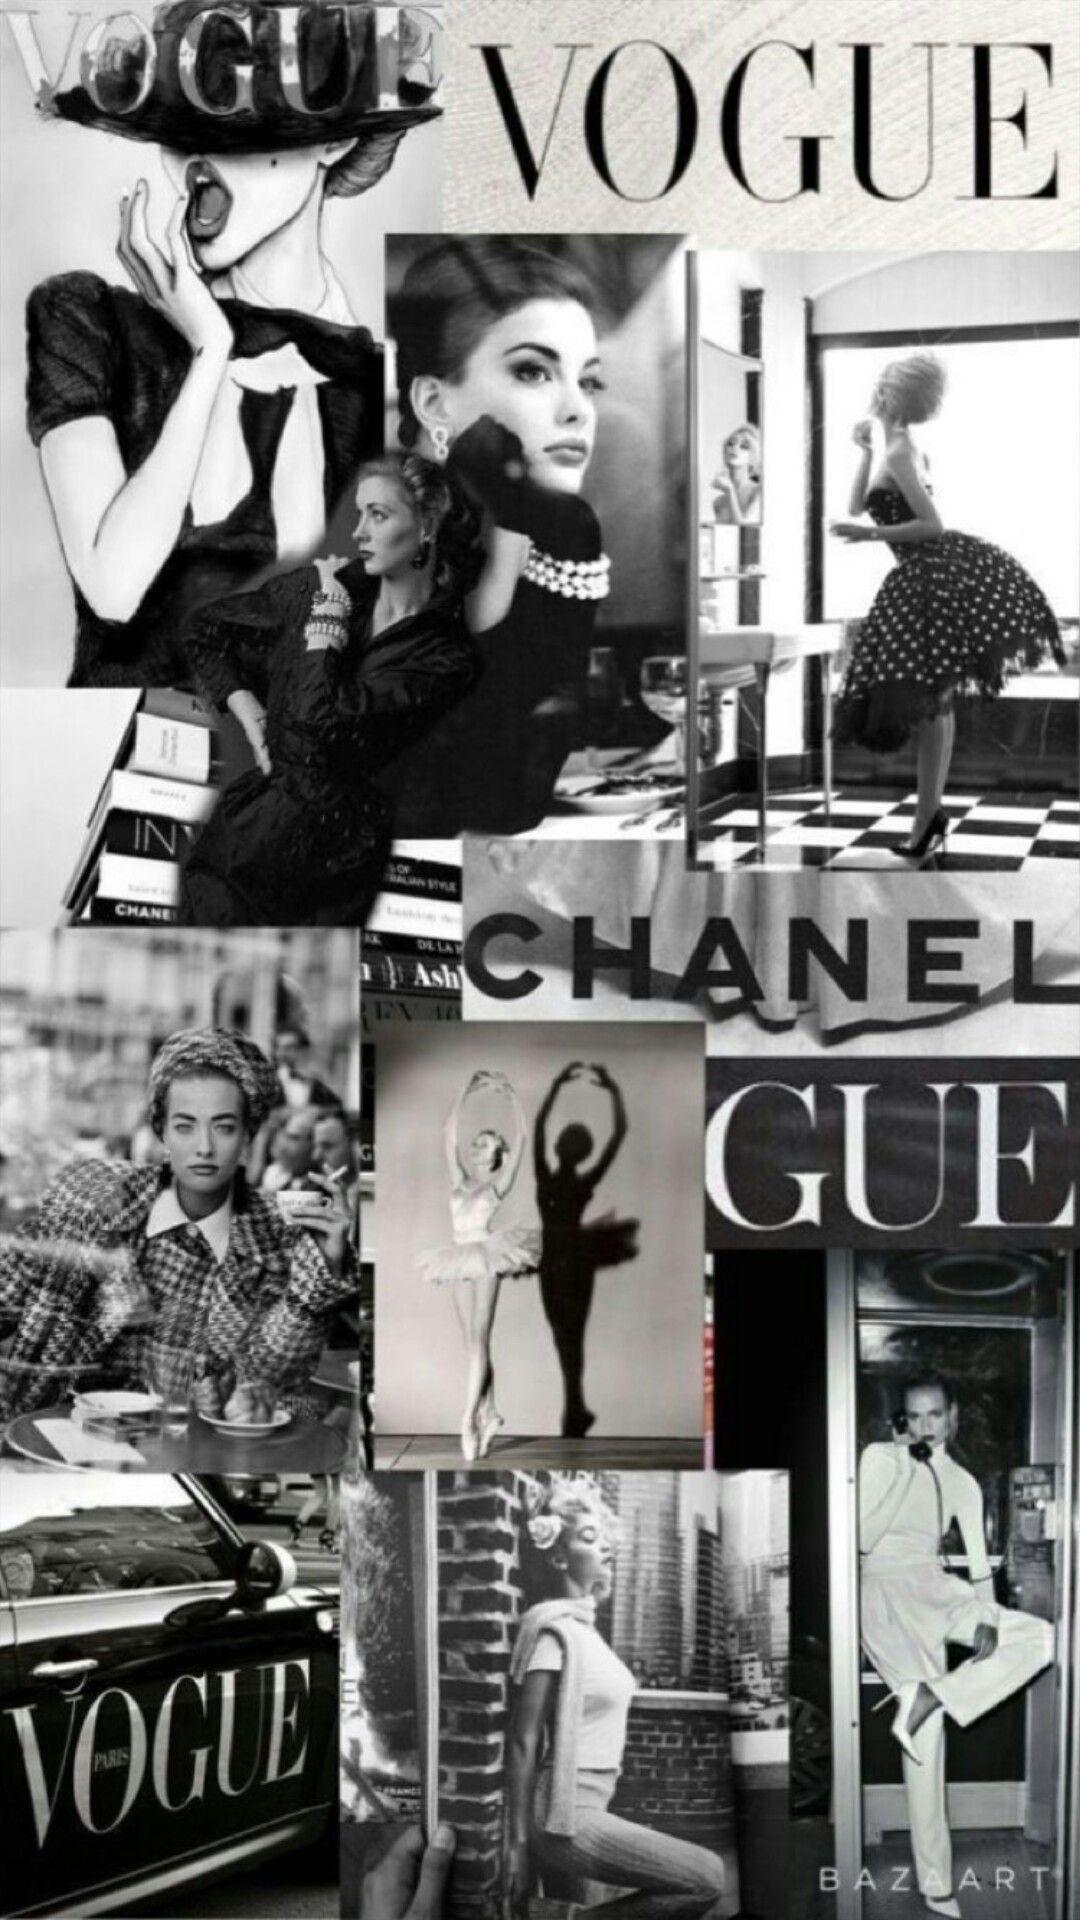 Fashion Magazine Wallpaper Vogue wallpaper Aesthetic collage 1080x1920